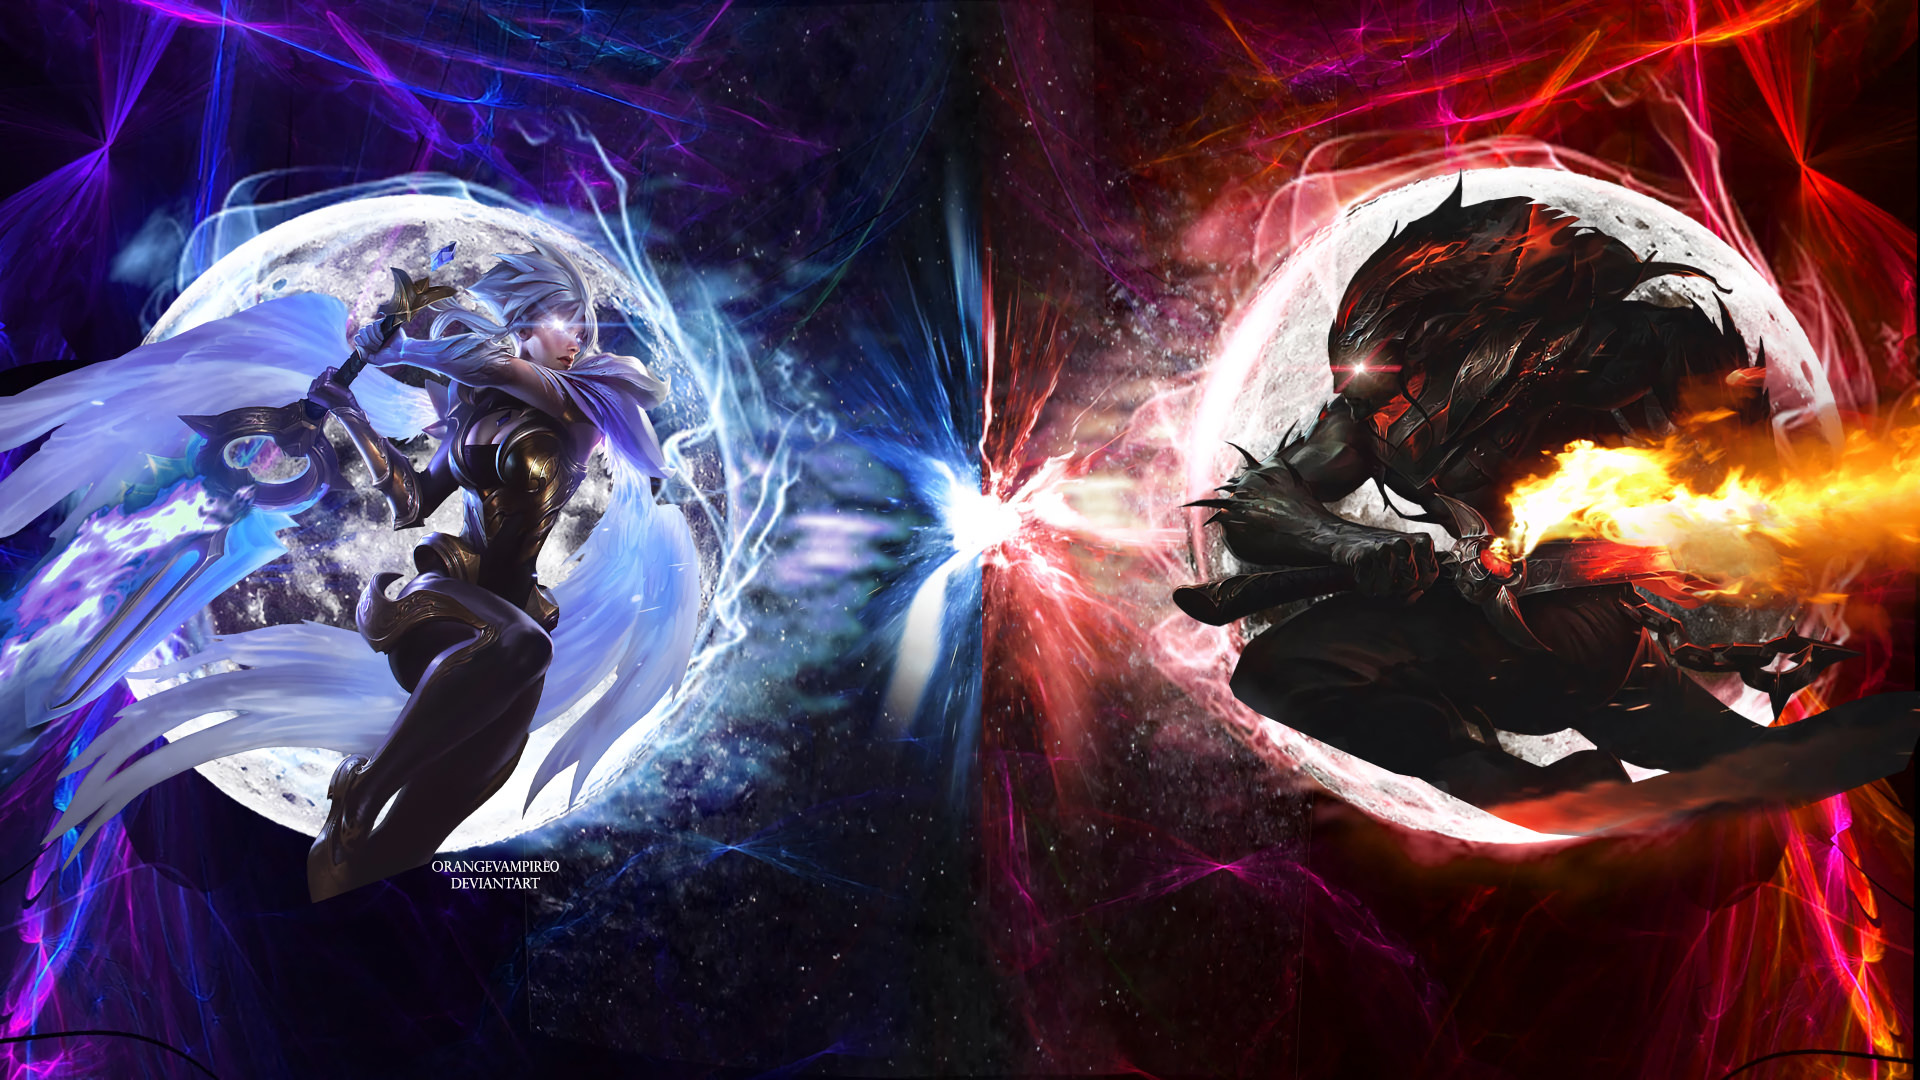 Dawnbringer Riven & Nightbringer Yasuo by orangevampire0 HD Wallpaper  Background Fan Artwork League of Legends lol